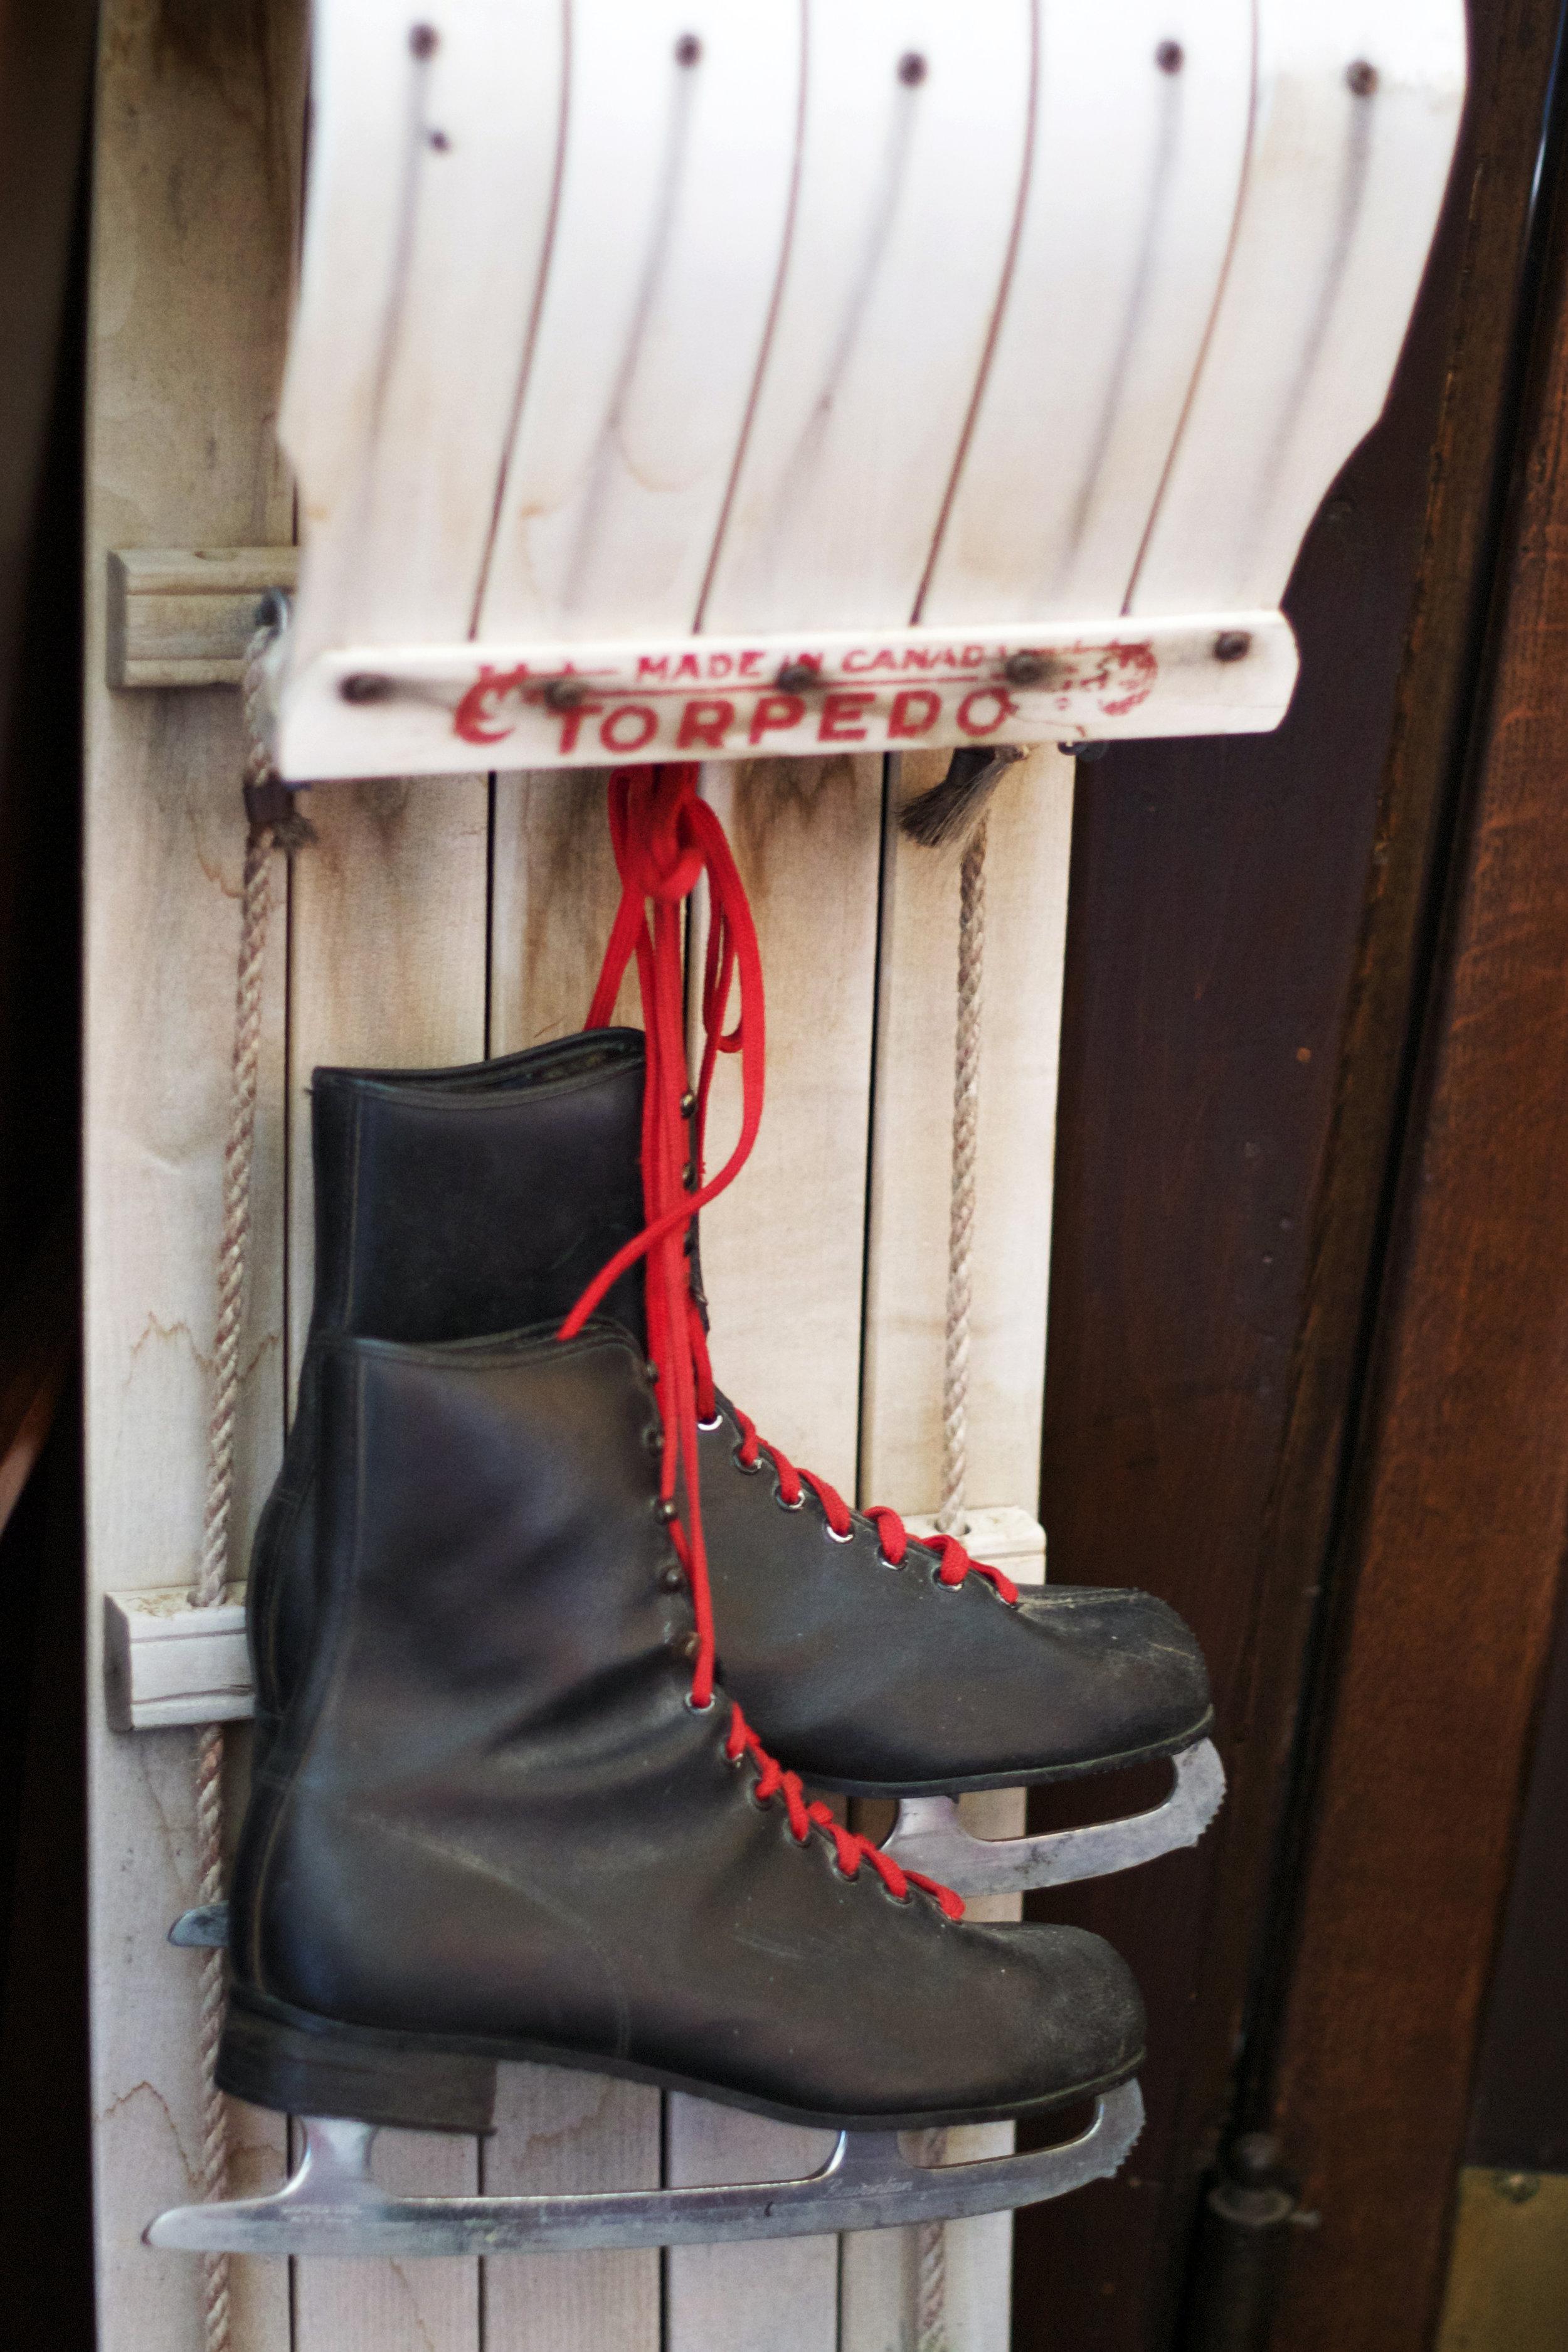 black-skates-on-toboggan.jpg